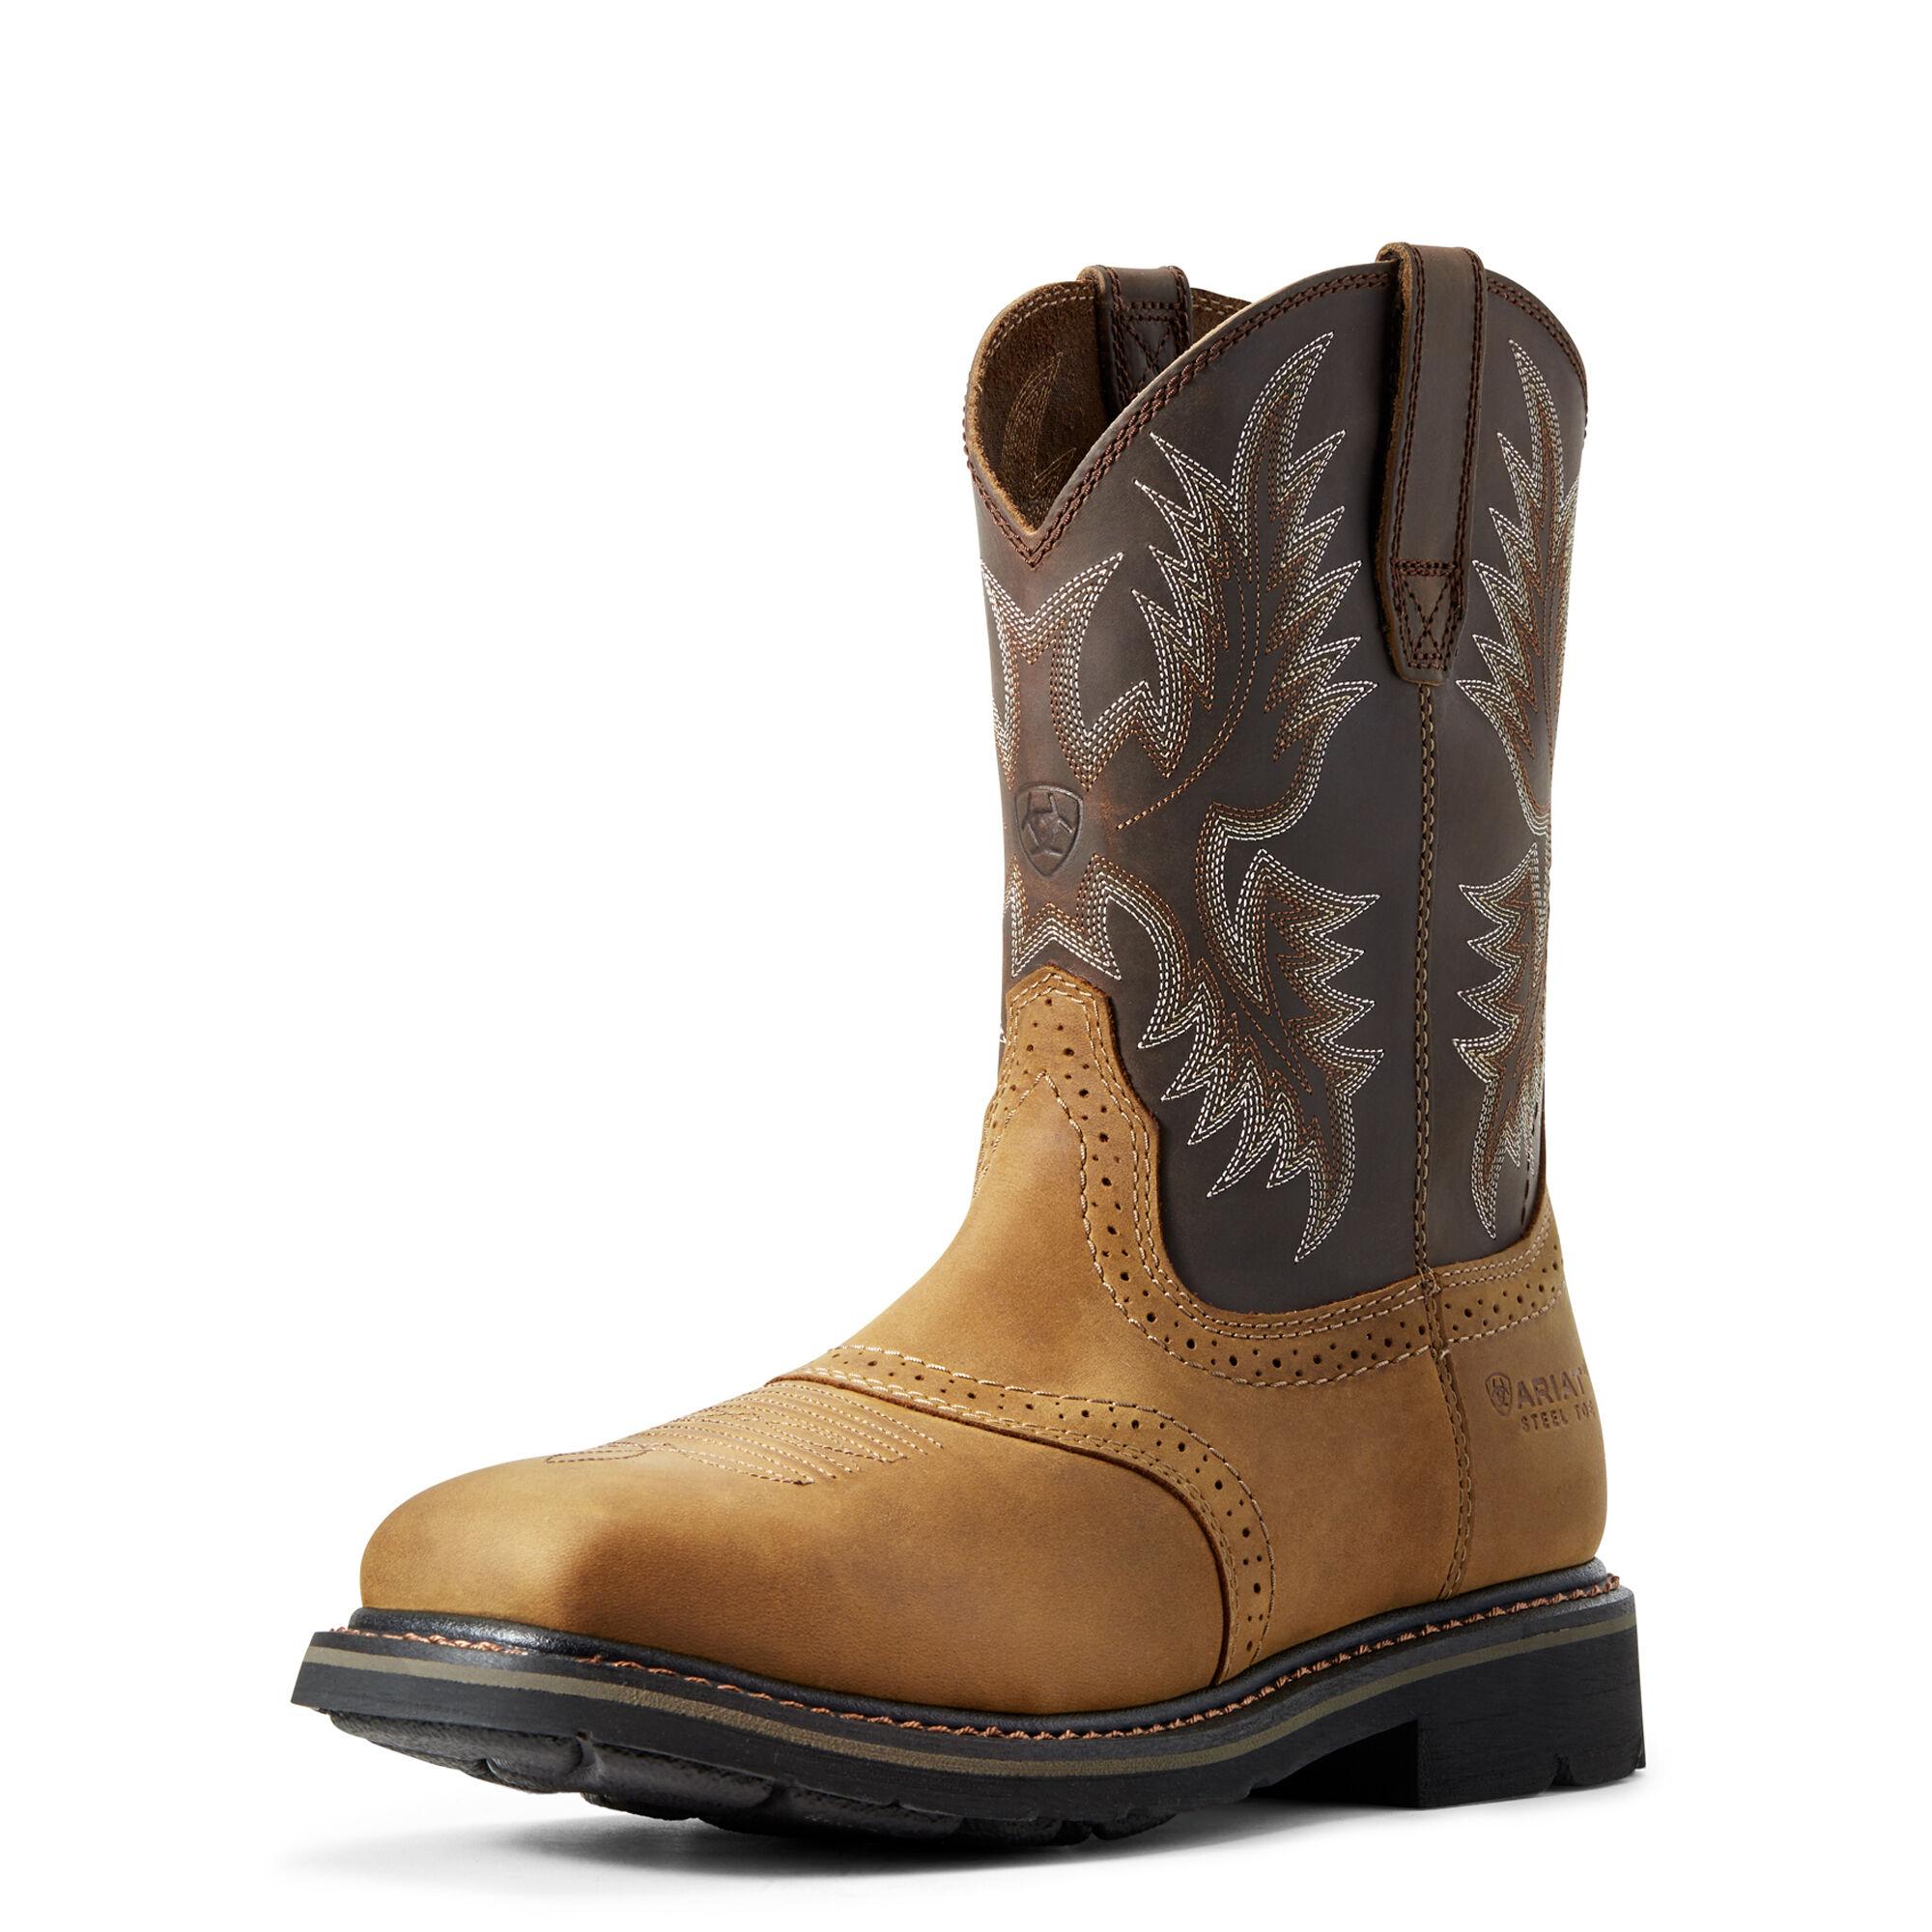 Men's Steel Toe Cowboy Boots \u0026 Steel